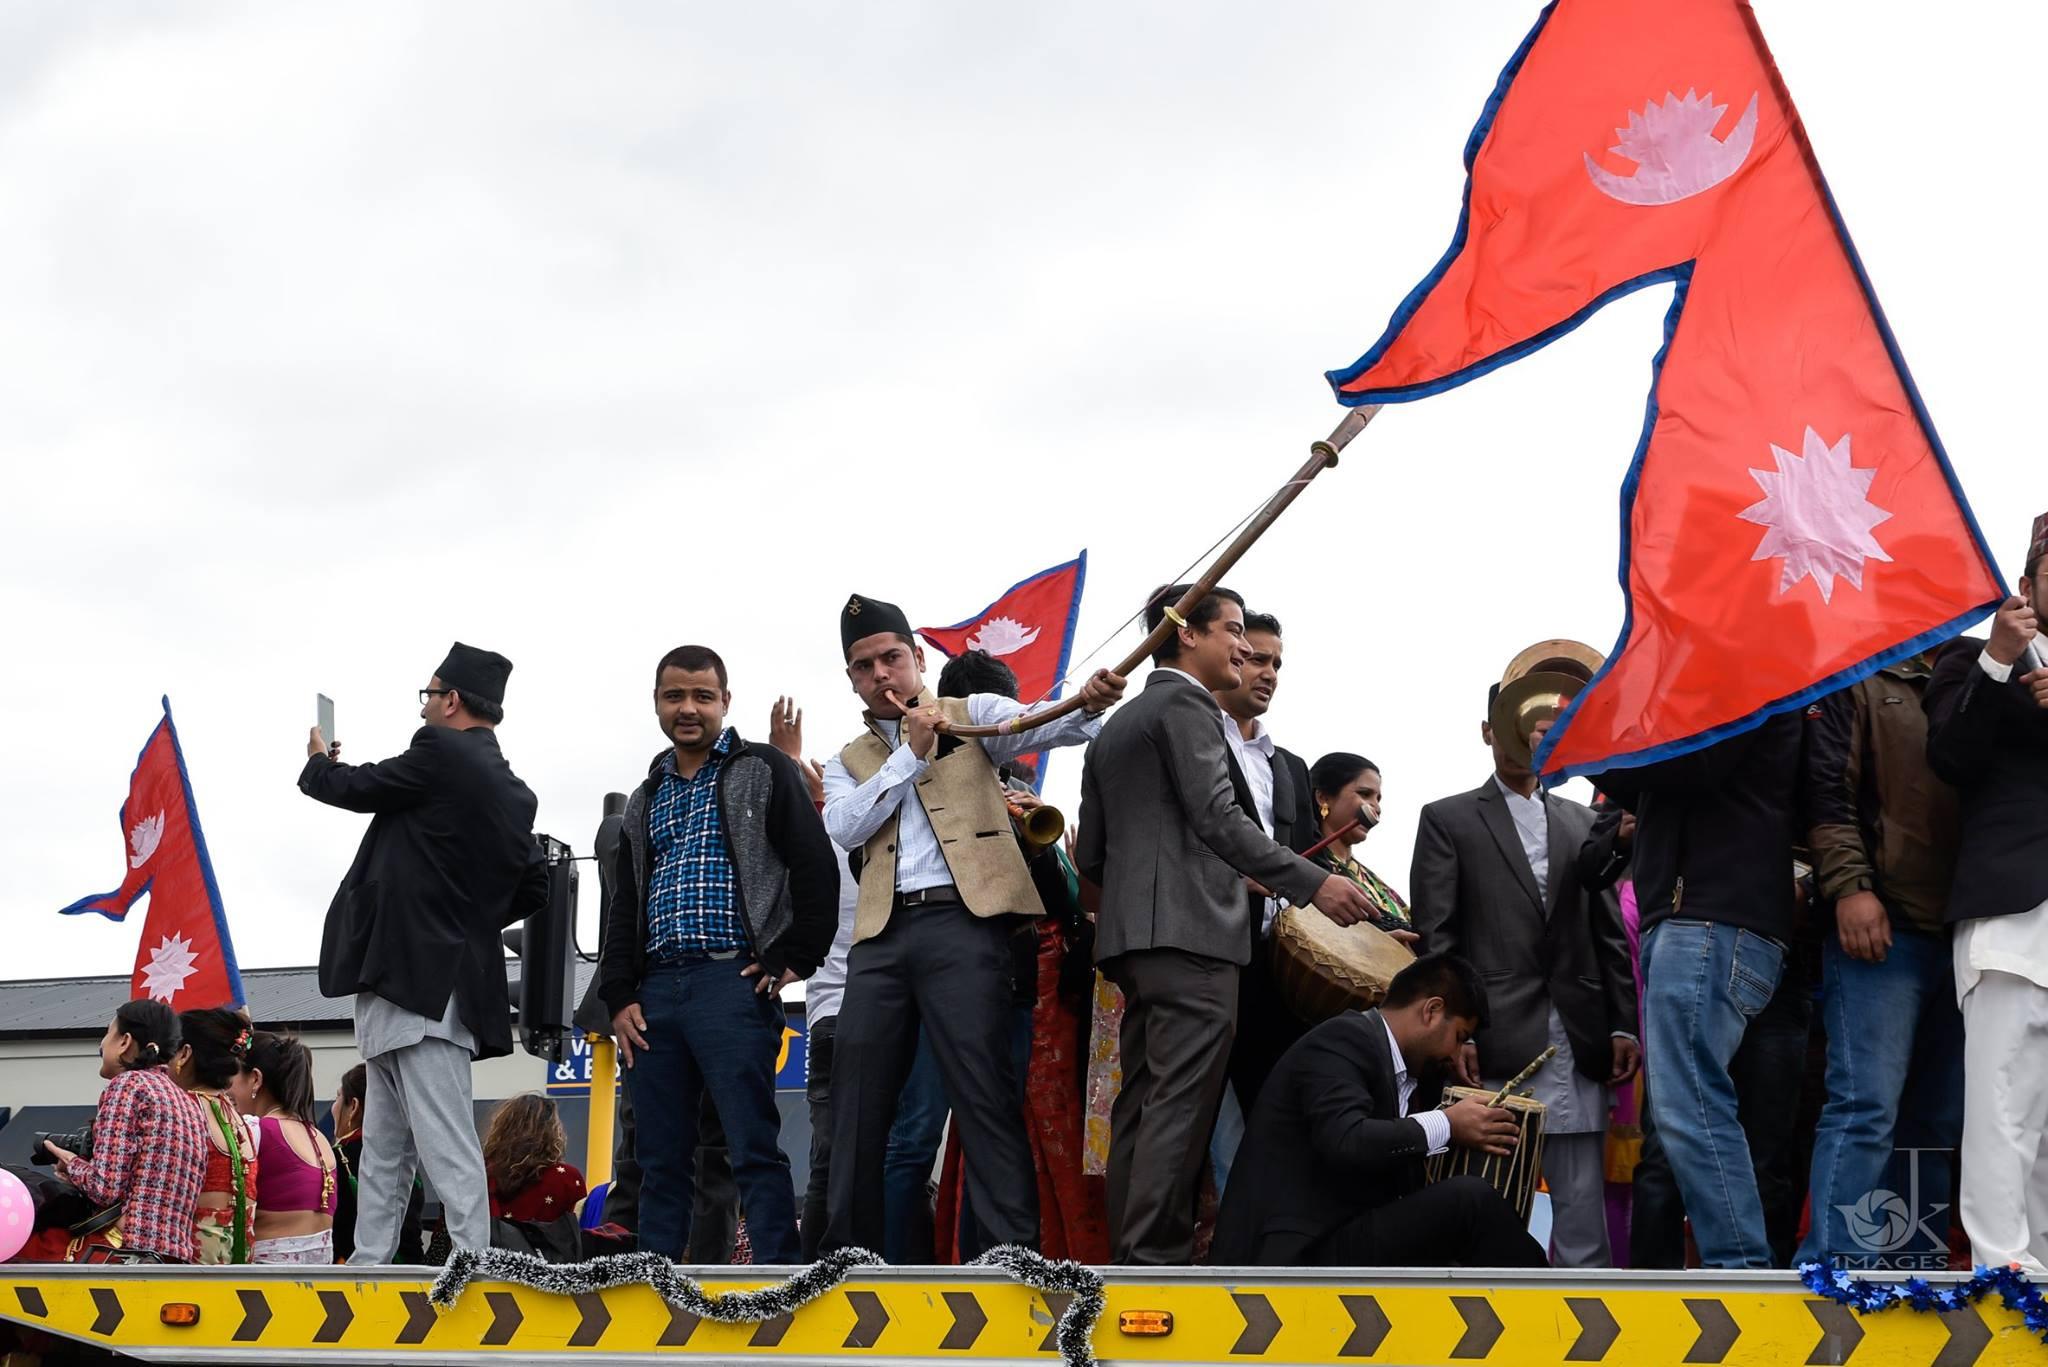 nepalese.jpg